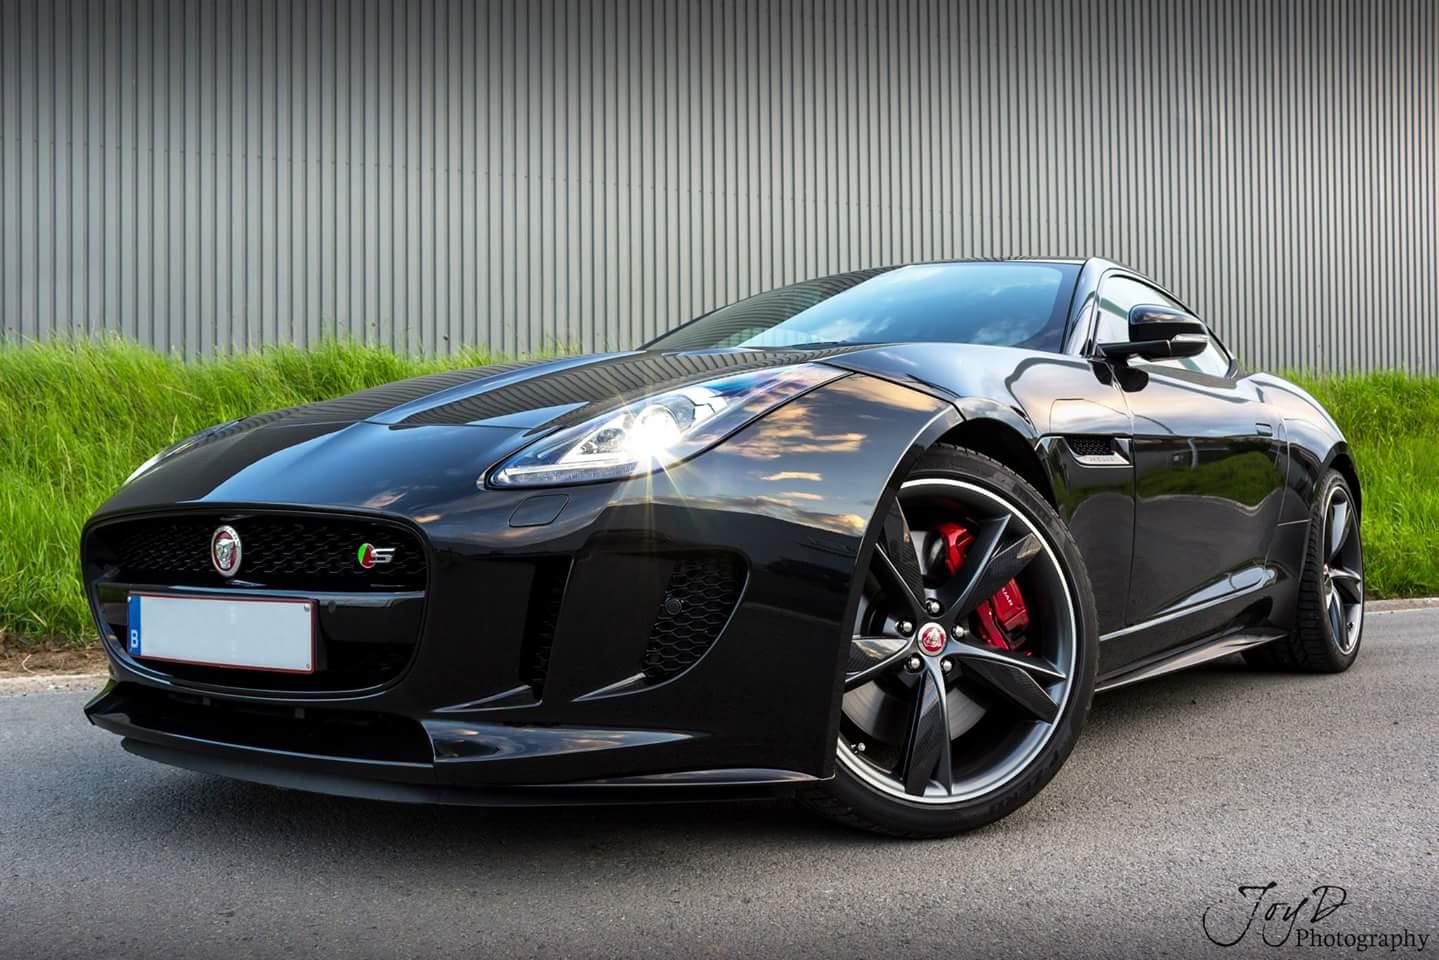 Jaguar FType S Coupe - 2015 jaguar f type s